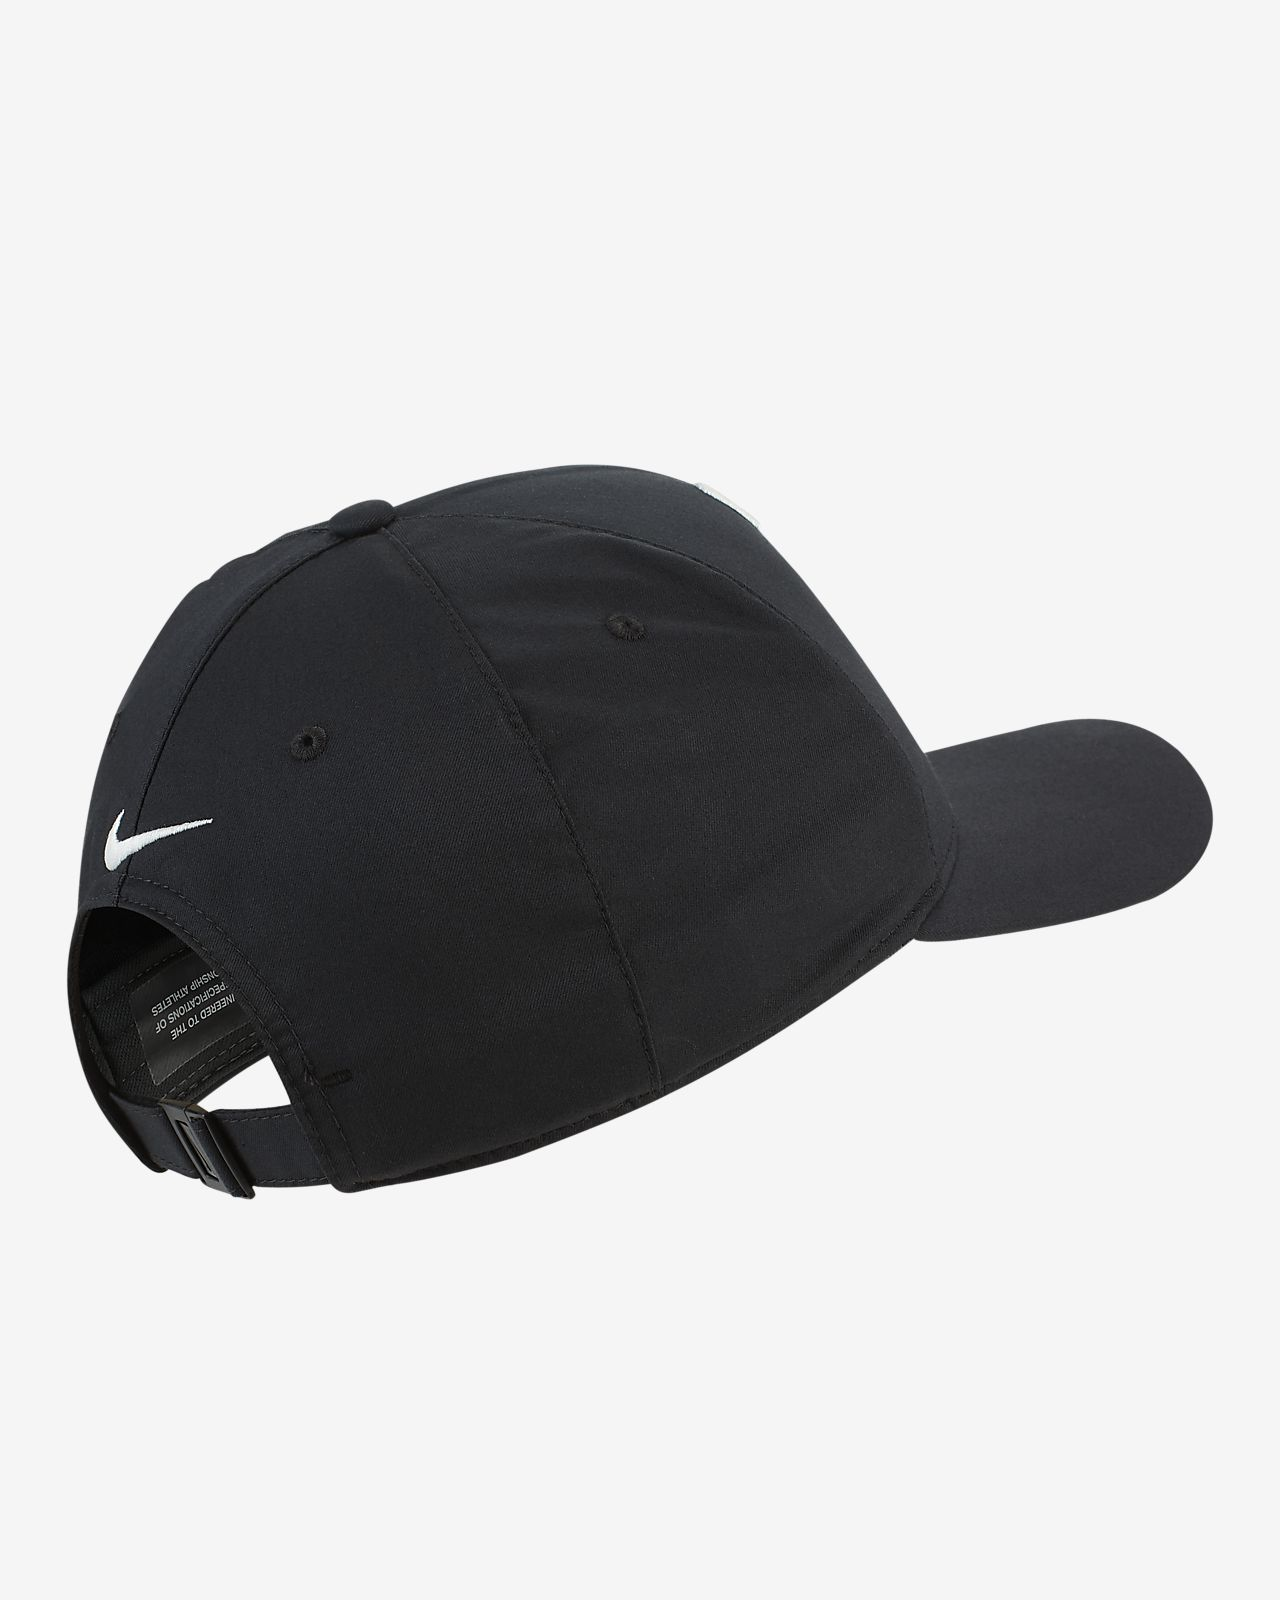 e73f8dd9827 Nike AeroBill Classic99 Golf Hat. Nike.com GB